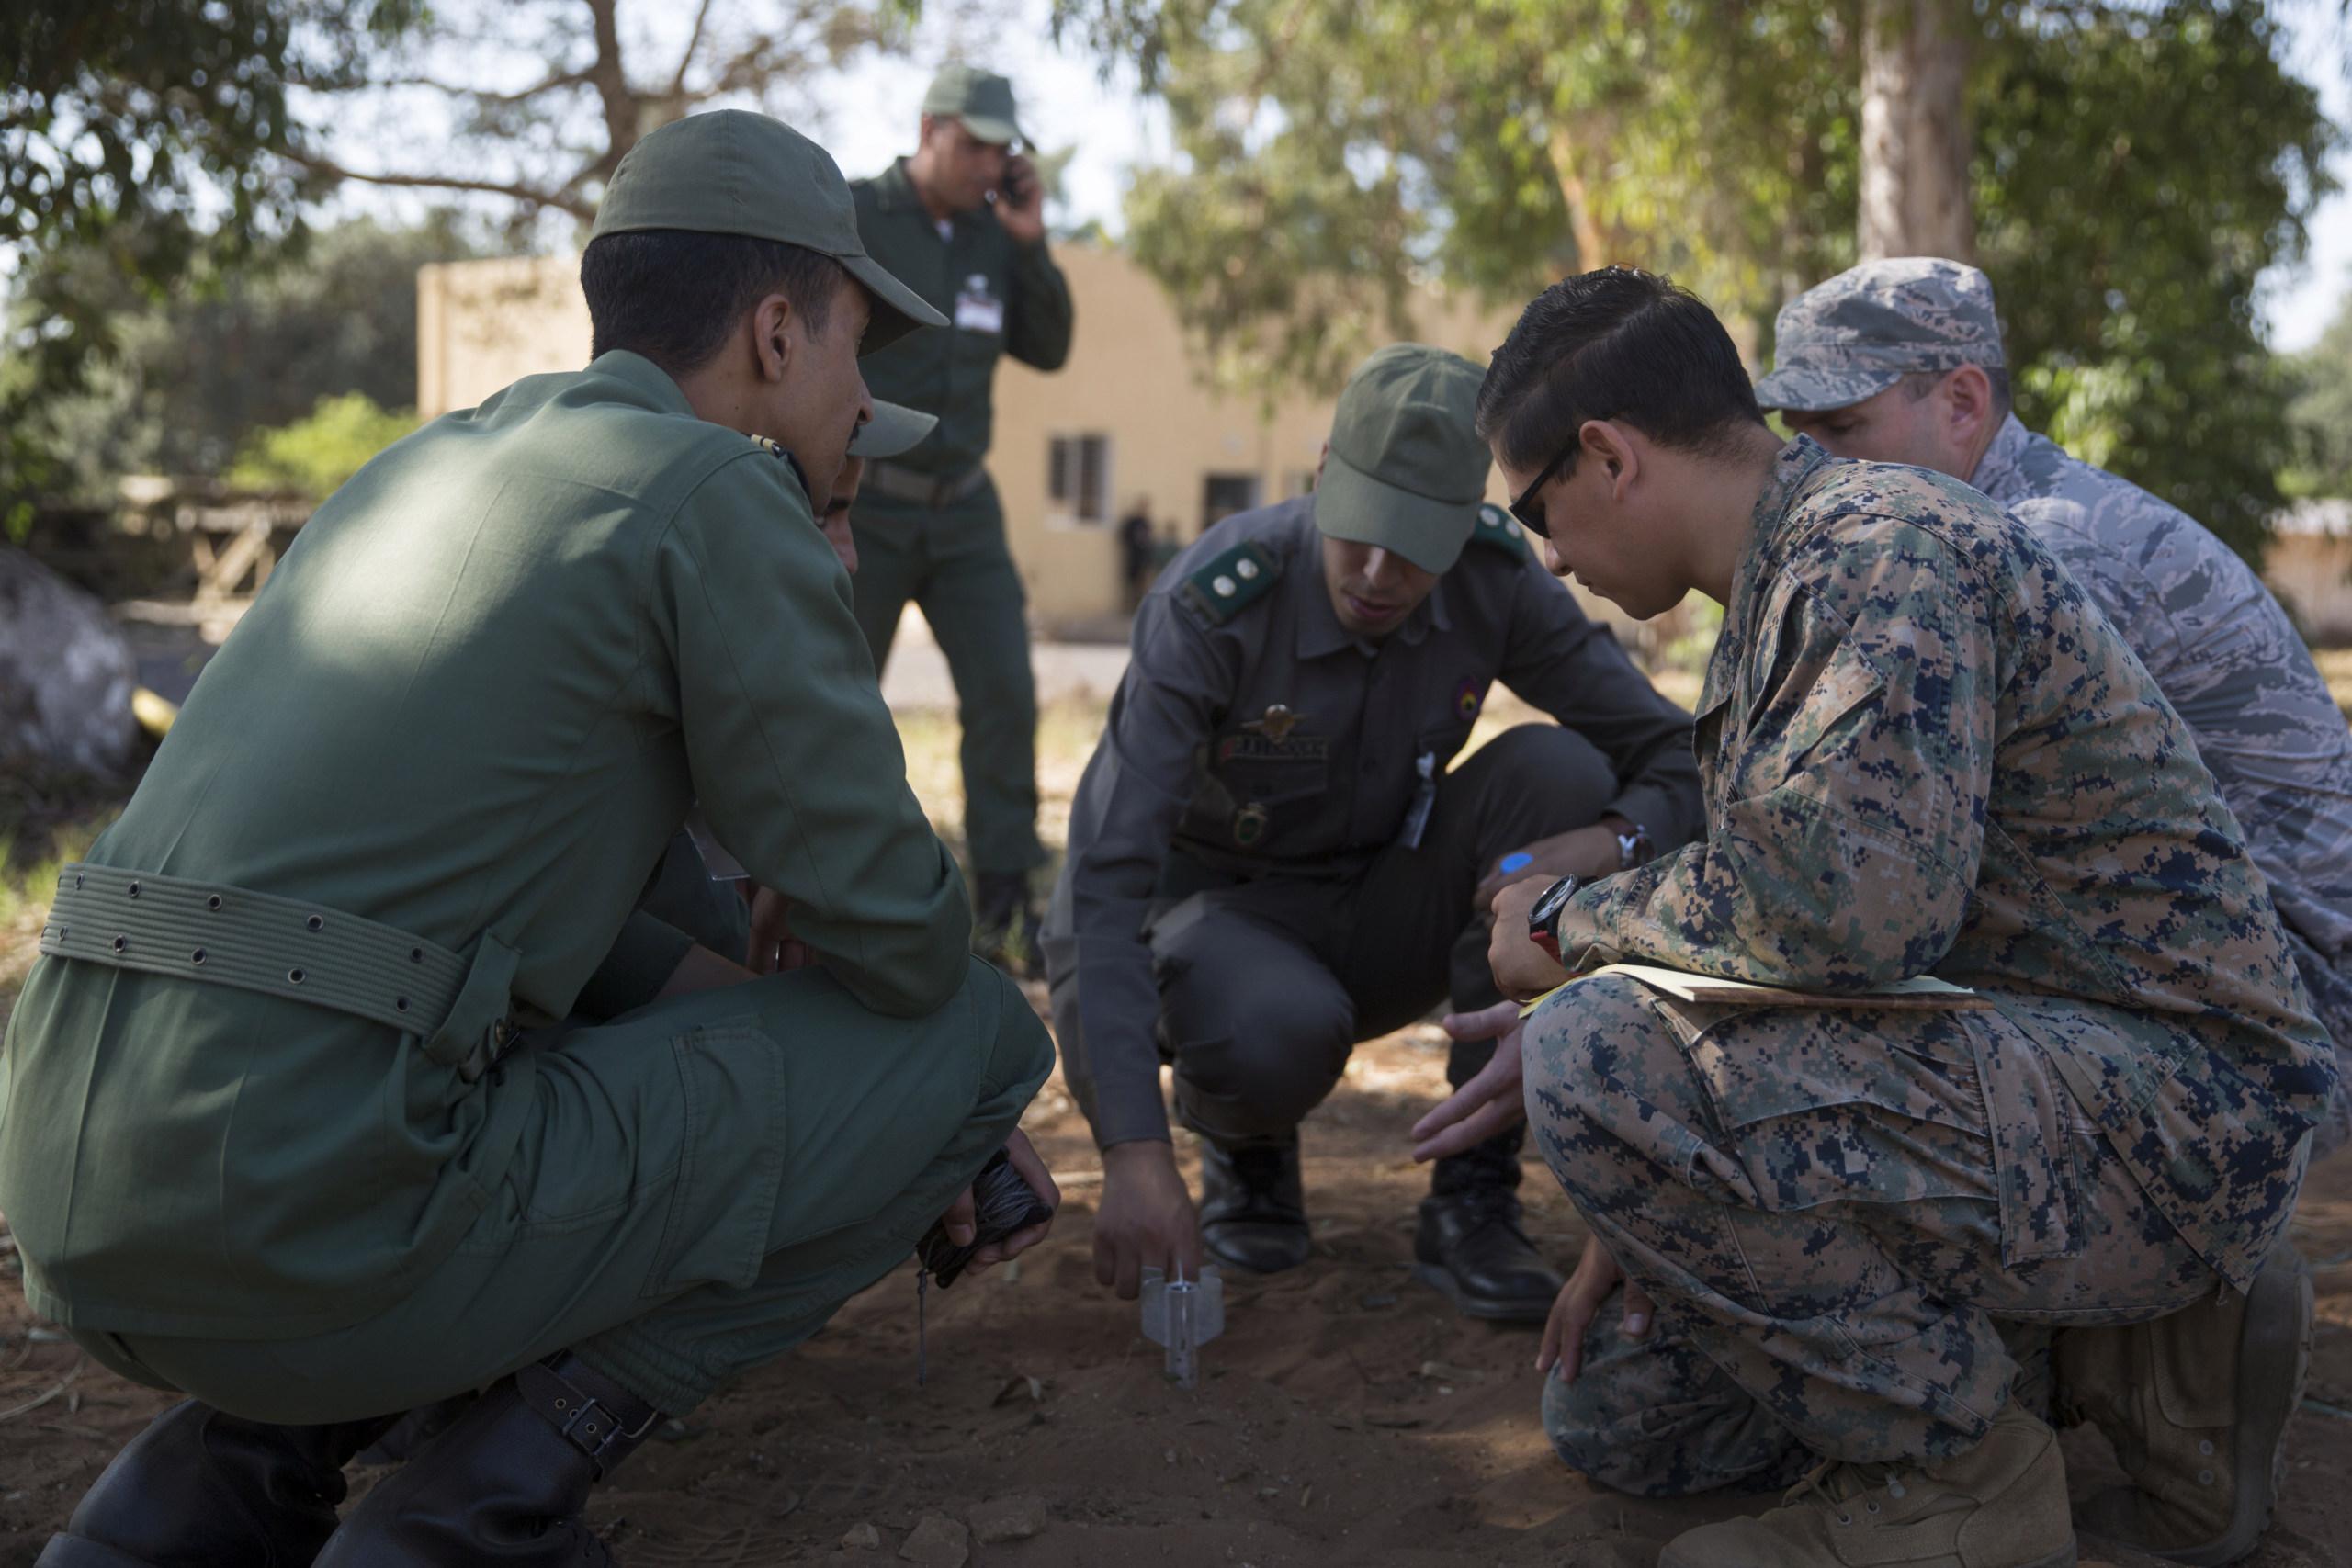 Cooperation militaire avec les USA - Page 6 01010